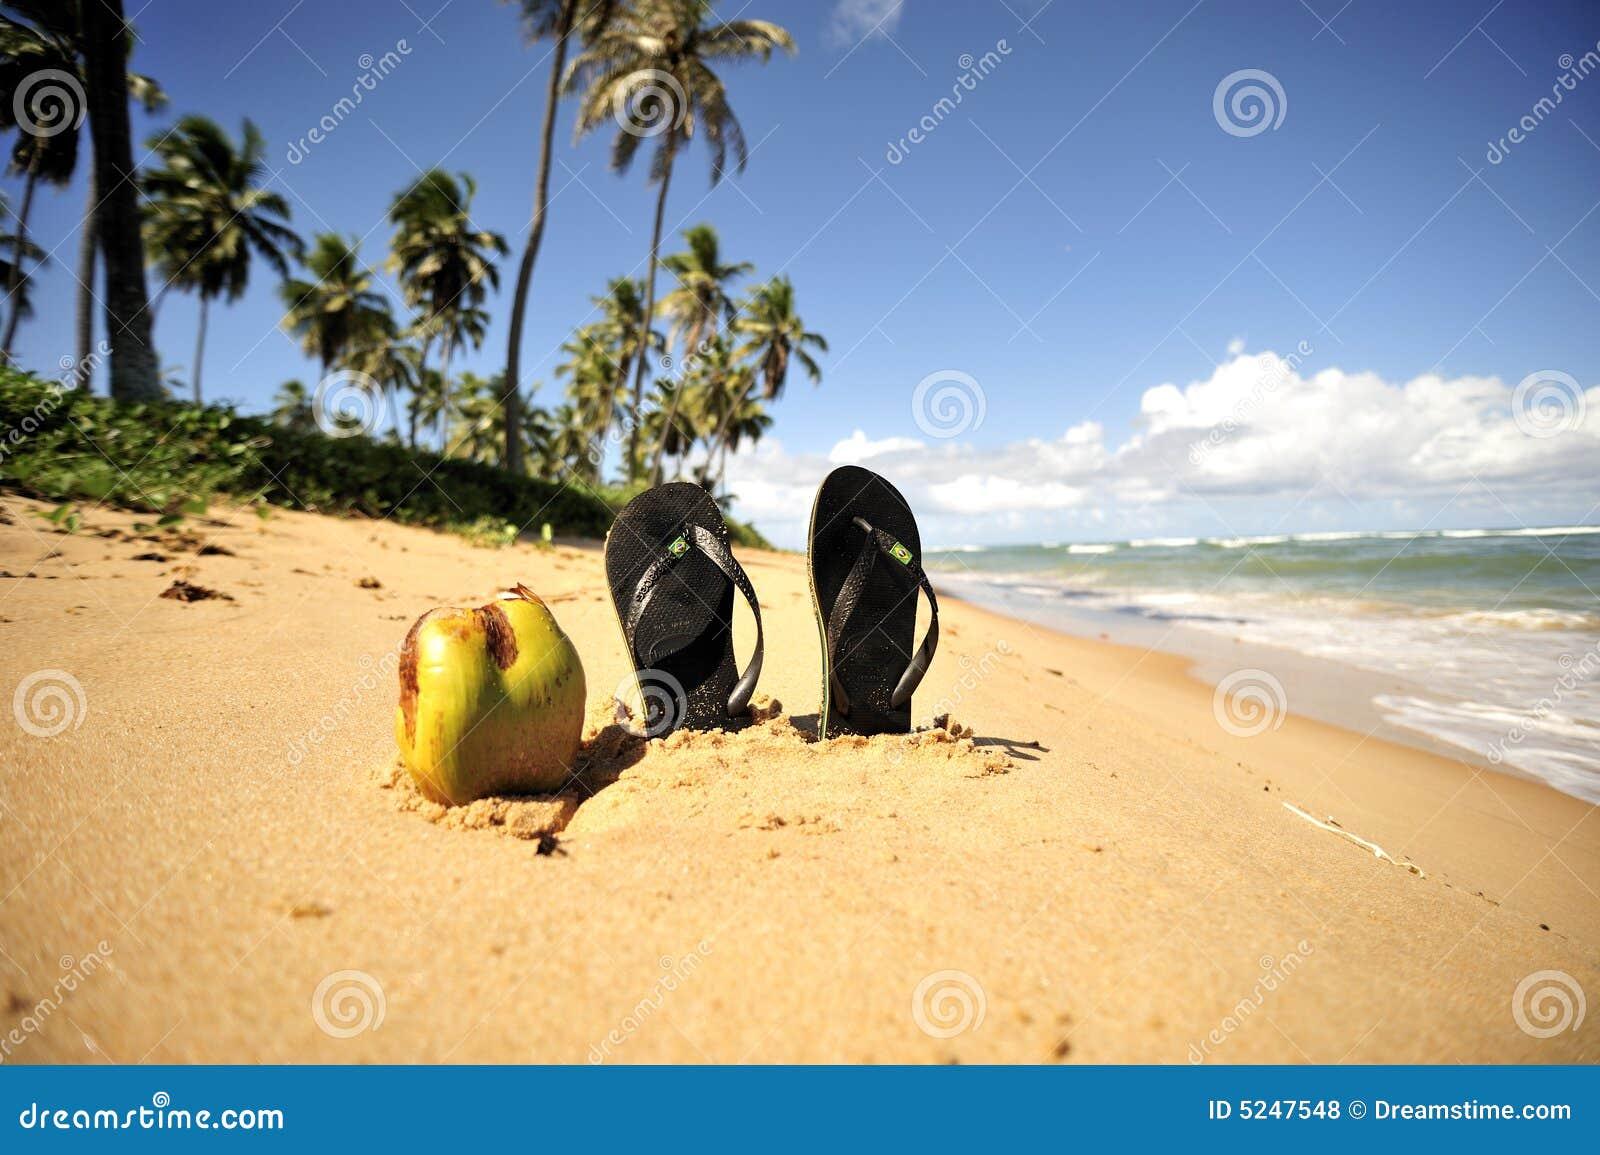 Plaży bahia br raju